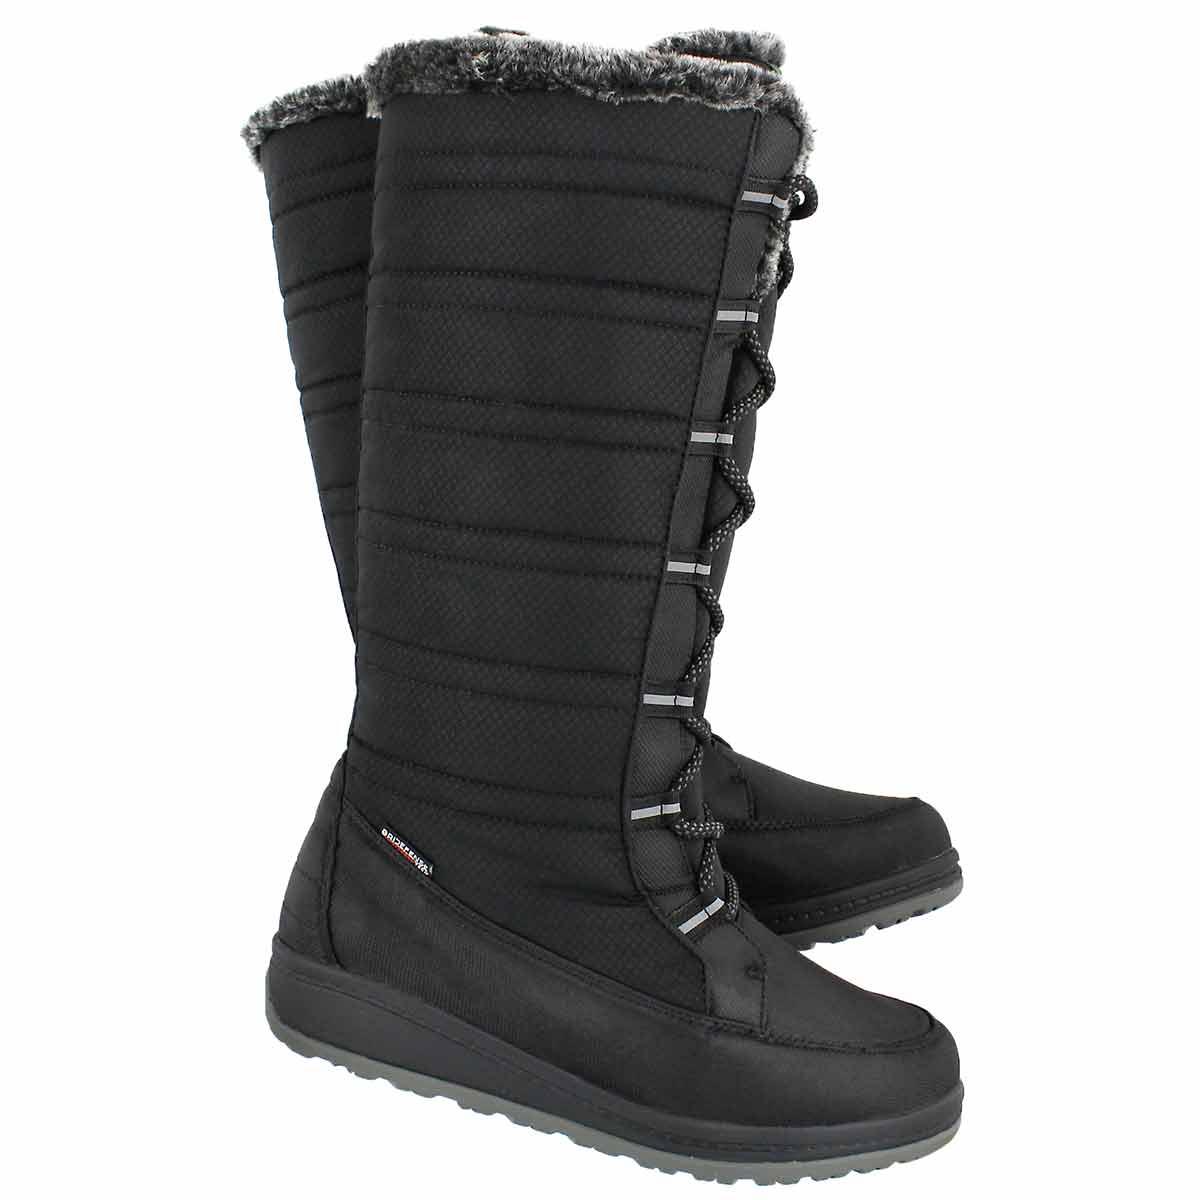 Lds Starling black wtpf winter boot